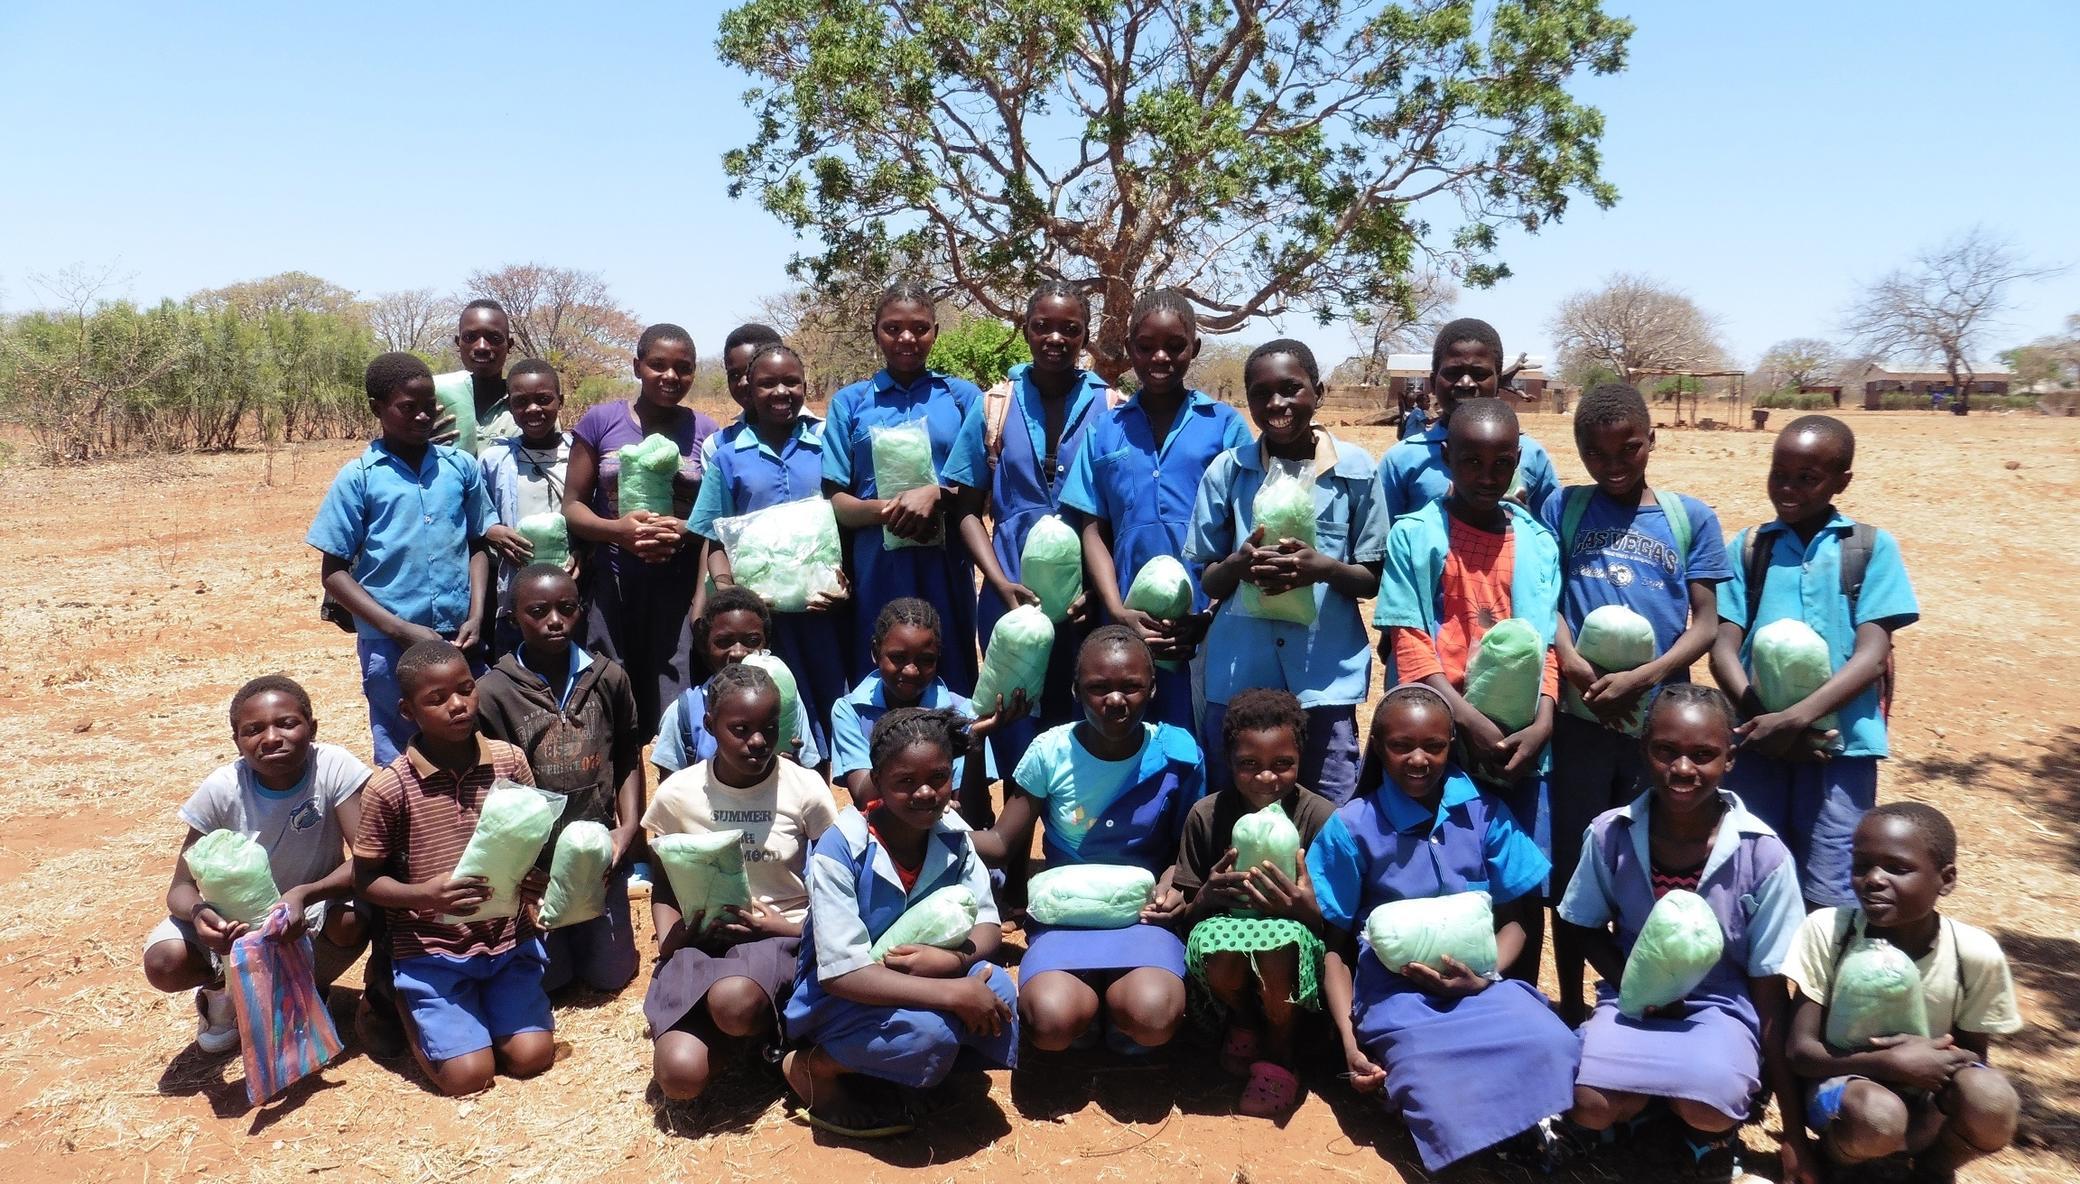 Malaria Prevention Saves Lives